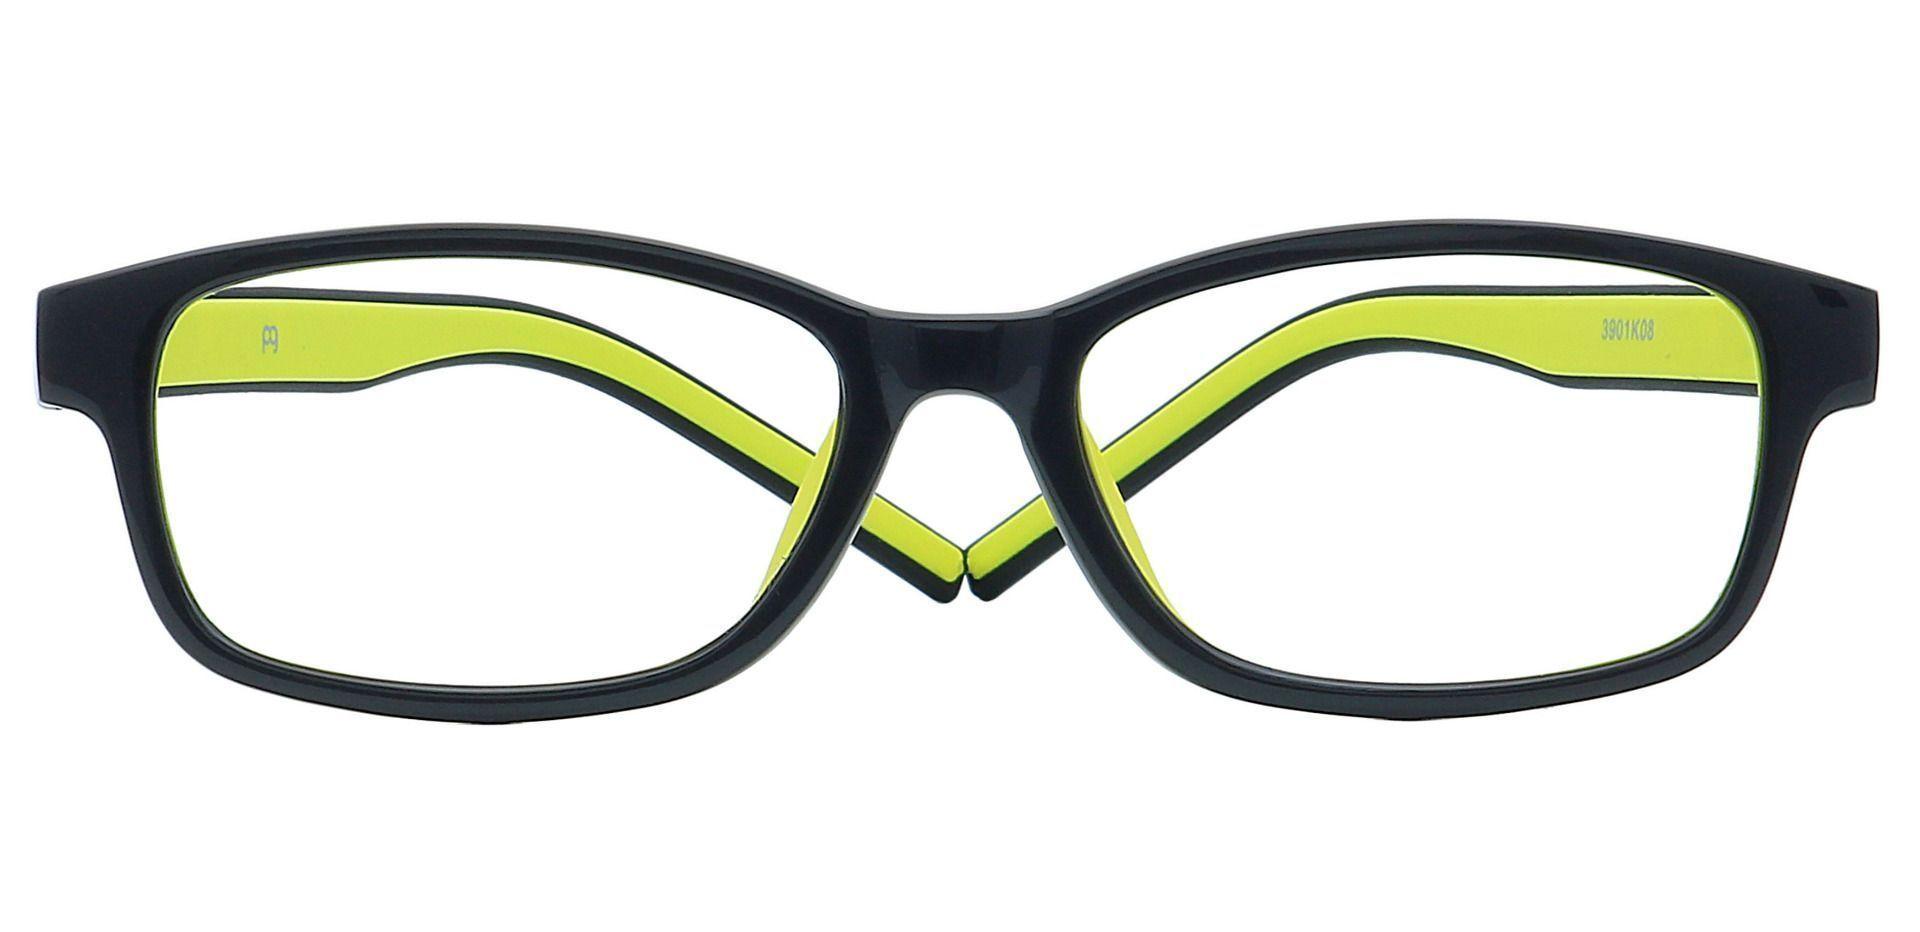 July Rectangle Non-Rx Glasses - Black